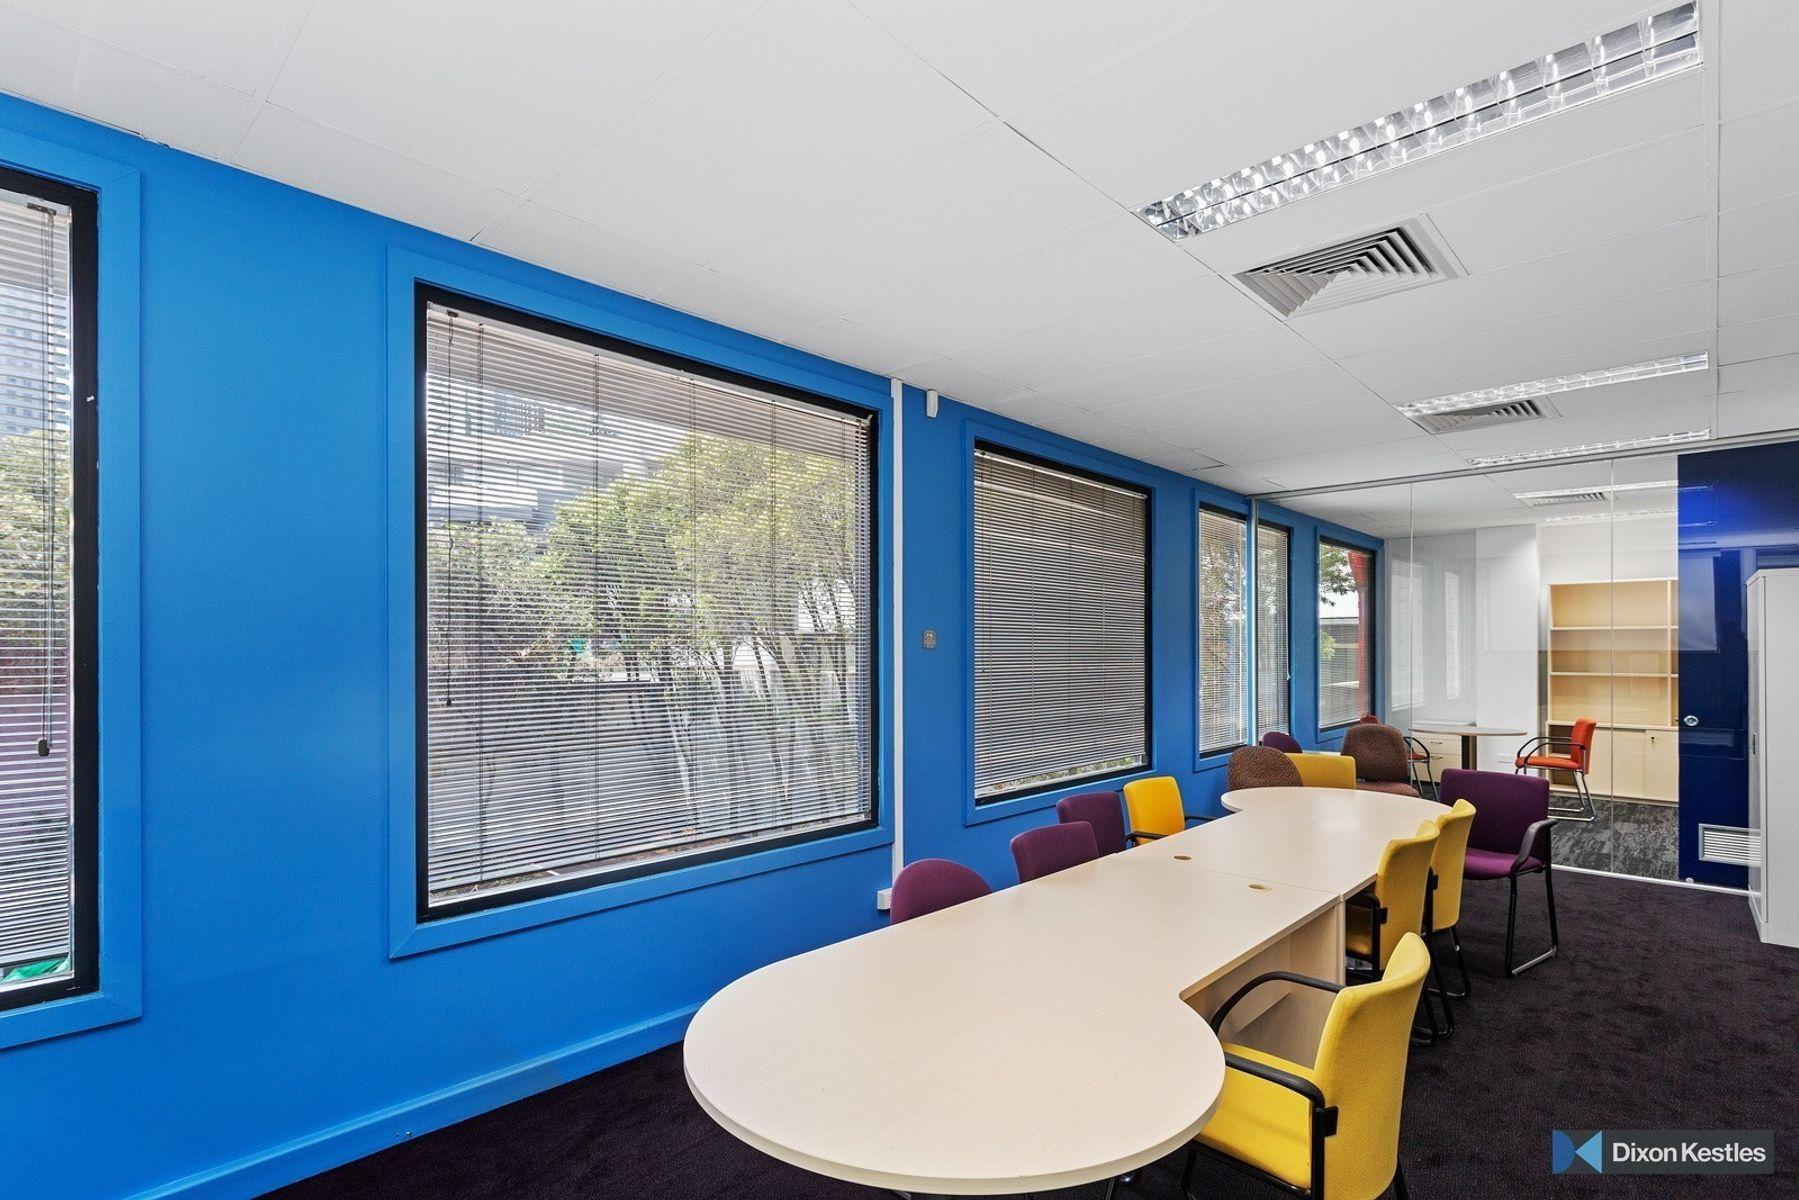 009 Open2view ID614688 72 Market St South Melbourne